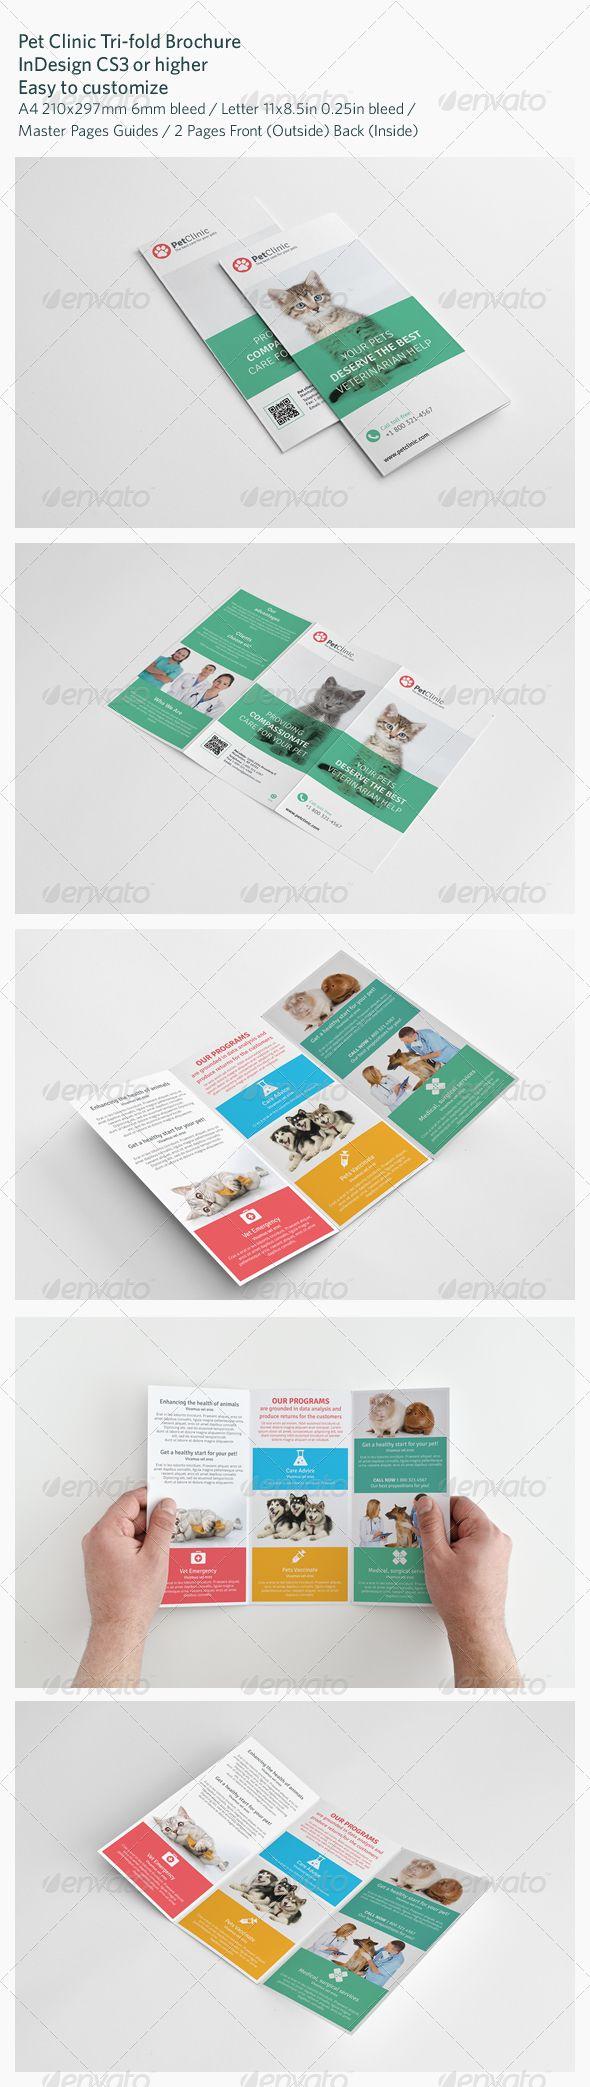 Pet Clinic Tri-fold Brochure - Brochures Print Templates